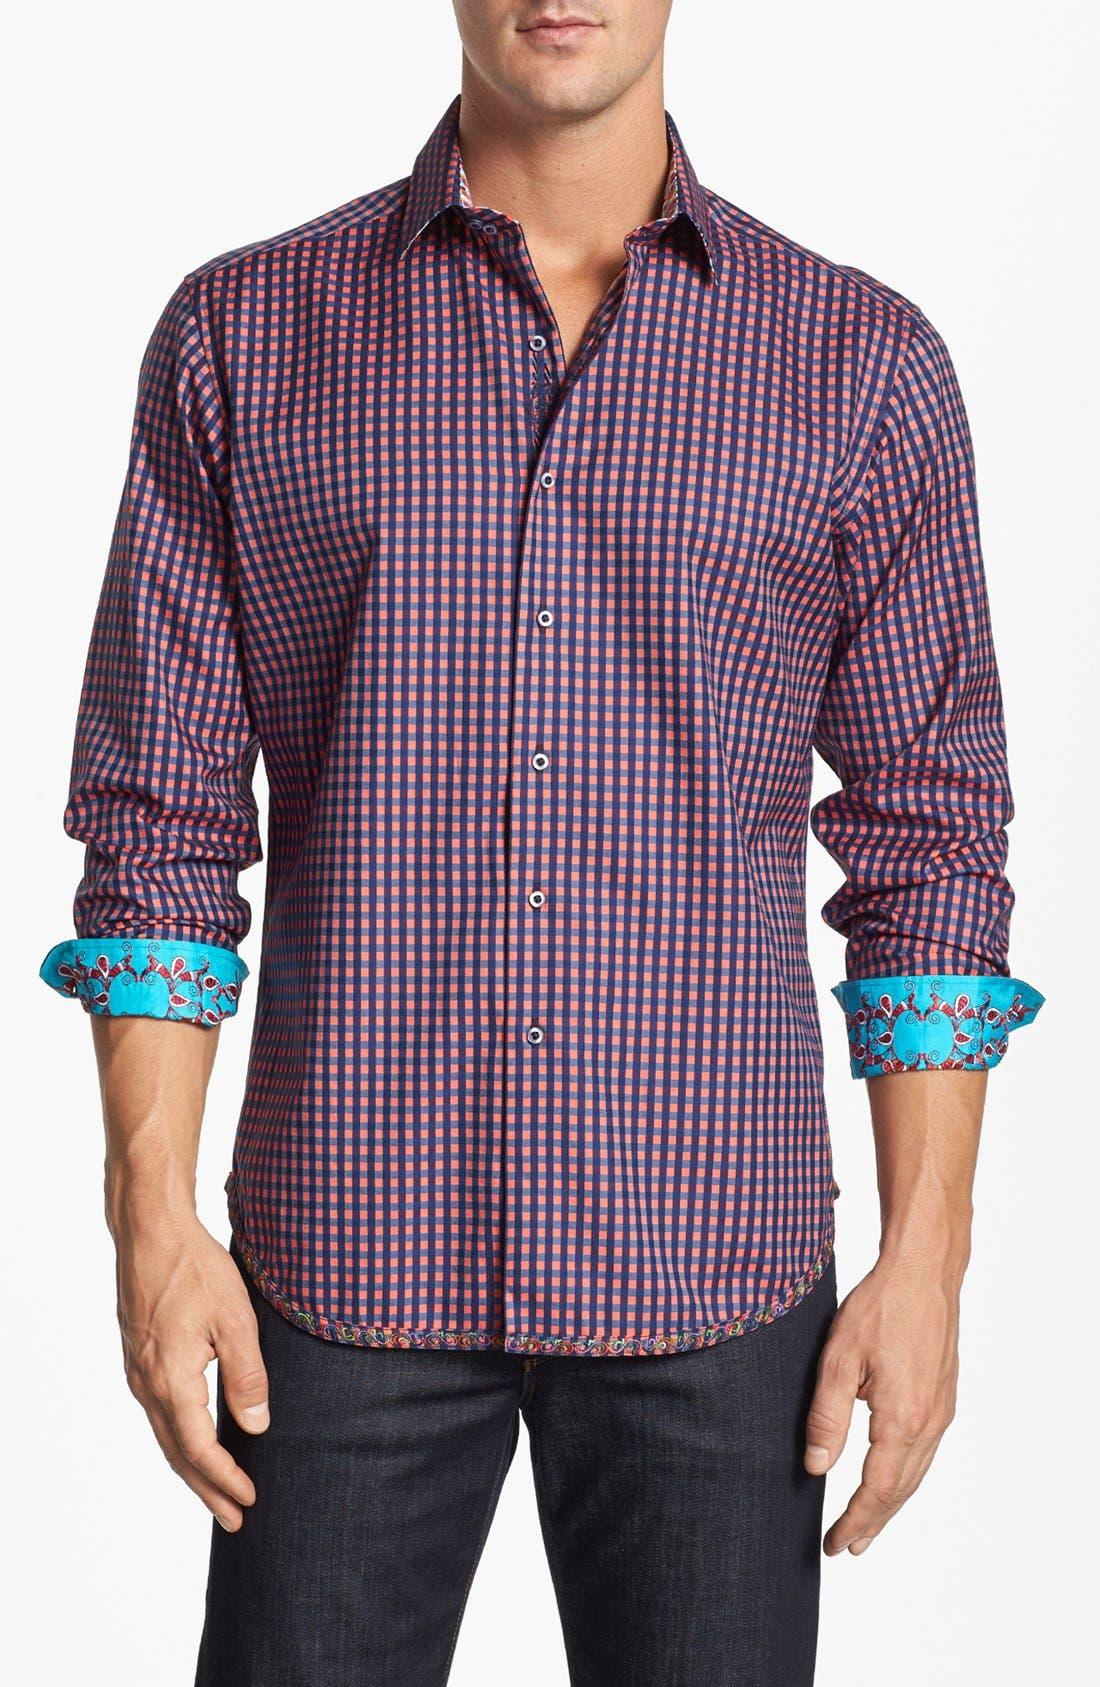 Alternate Image 1 Selected - Robert Graham 'Garrison' Regular Fit Sport Shirt